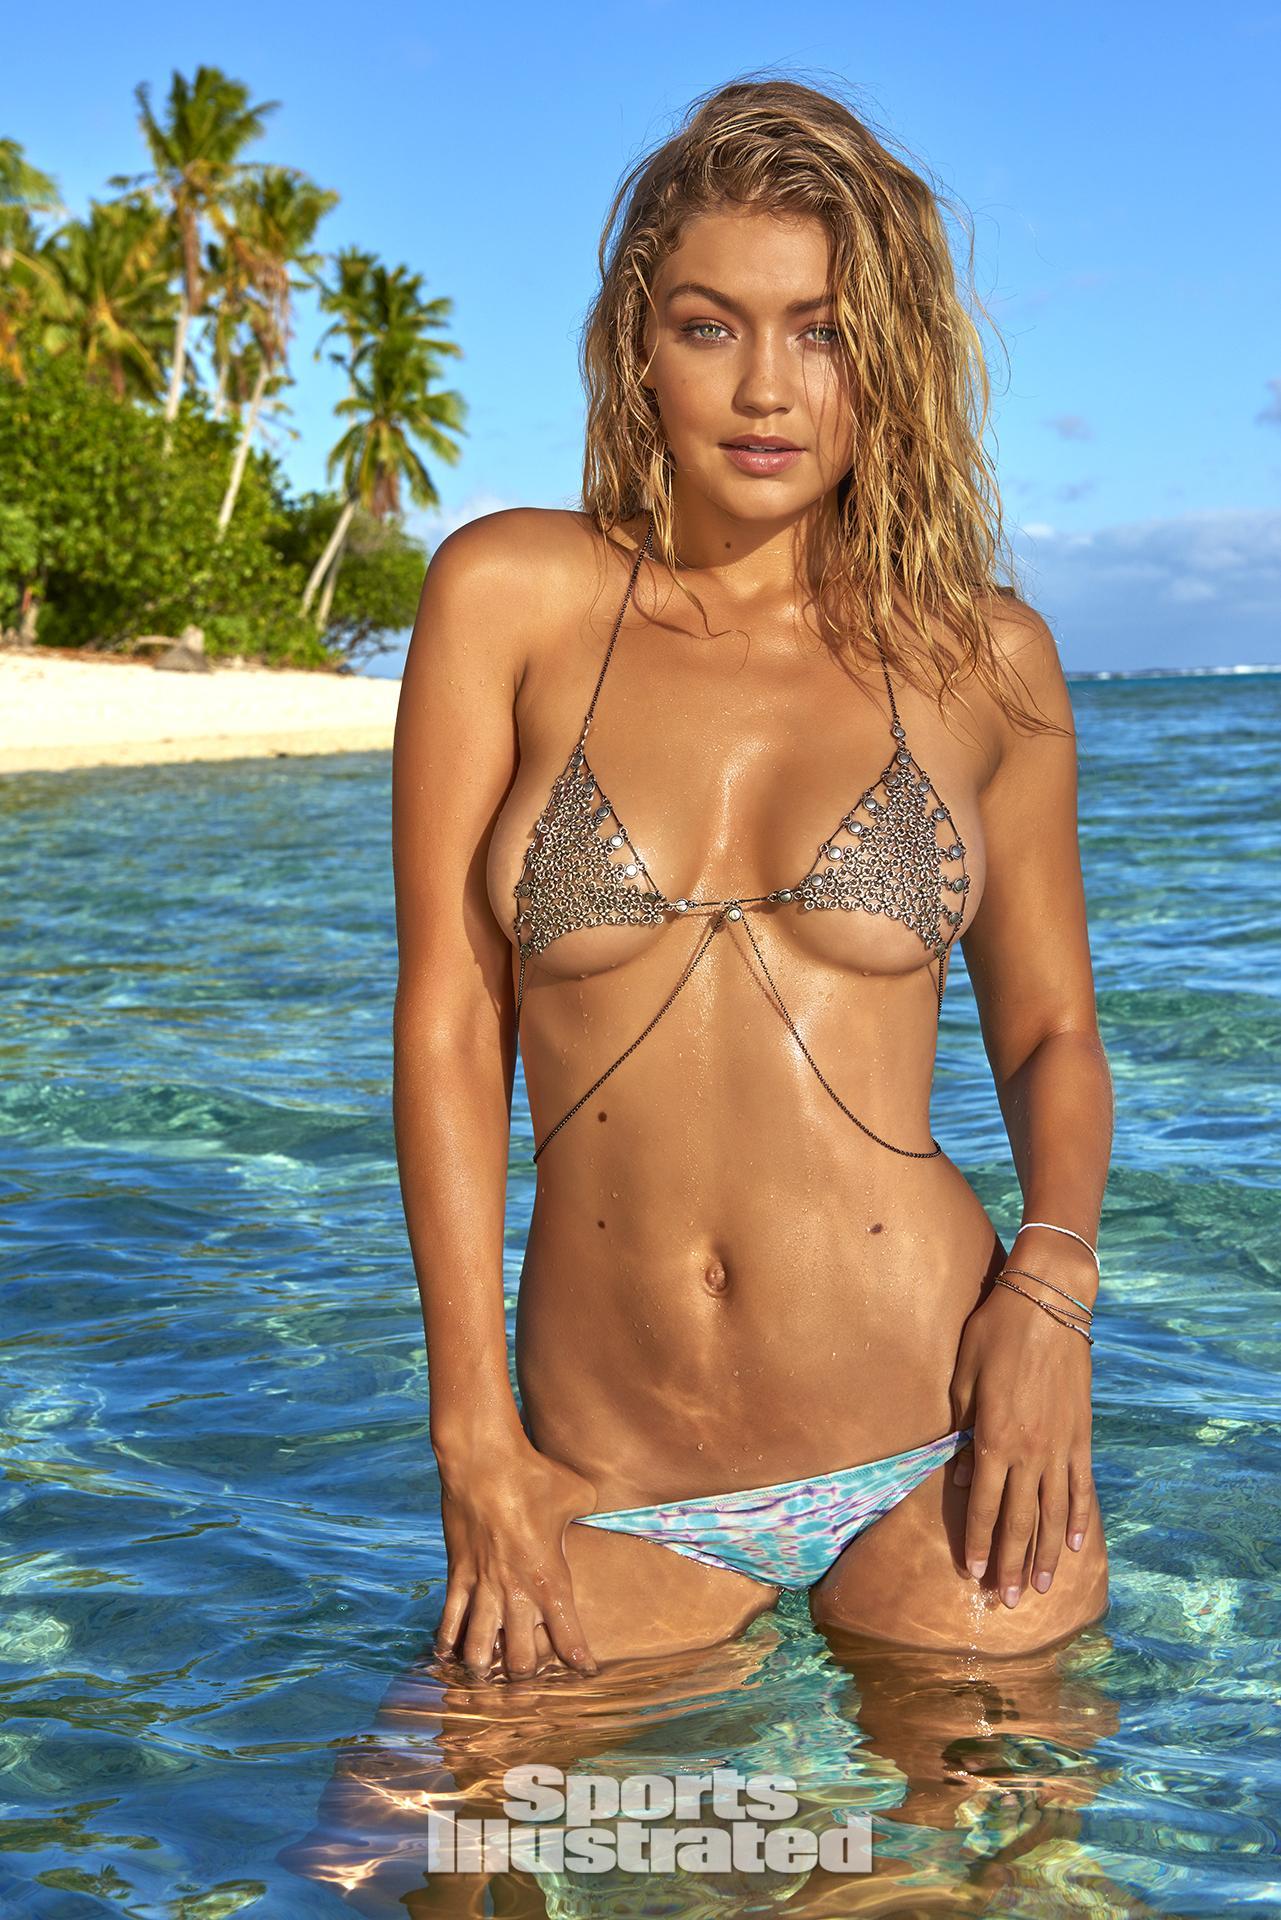 Pictures of Celebrities in Bikinis POPSUGAR Celebrity